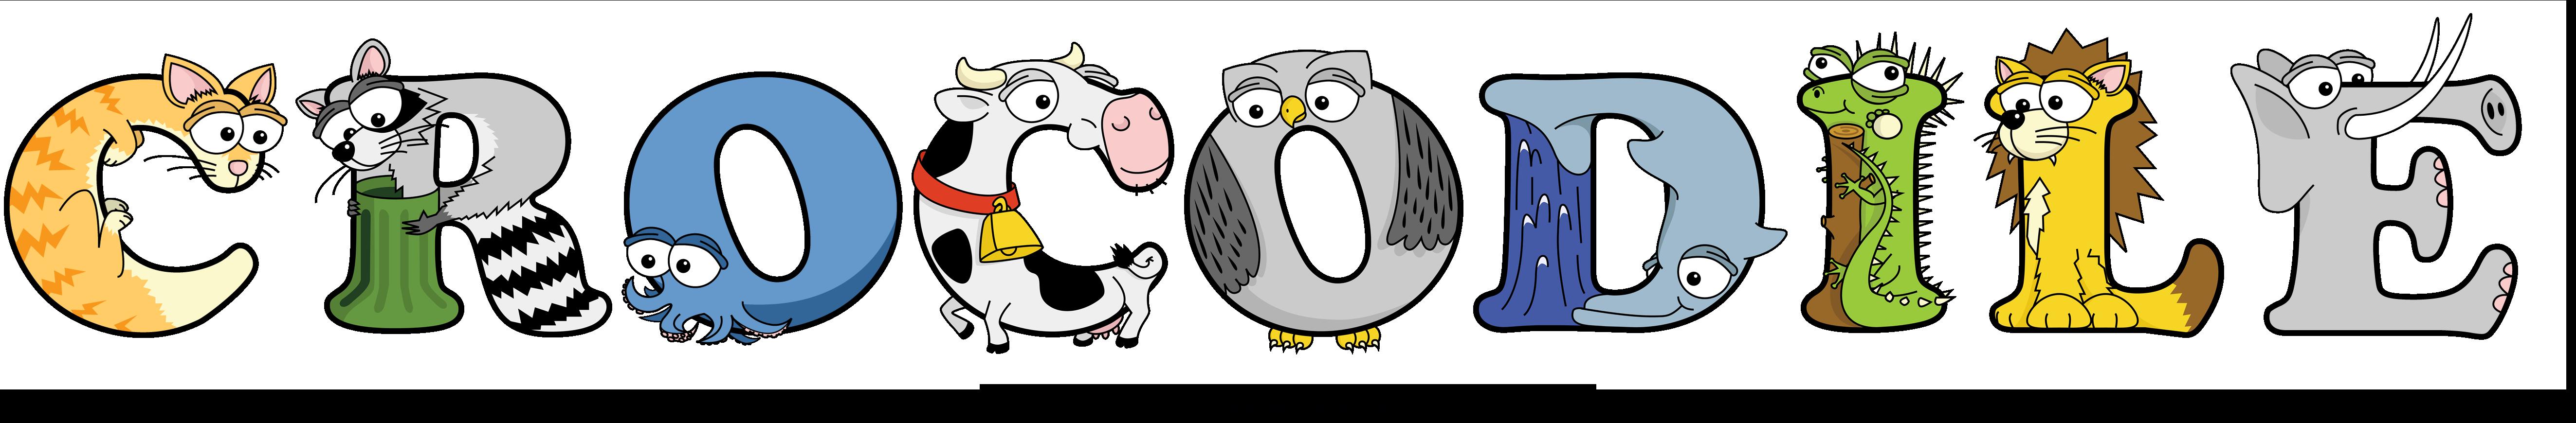 The word CROCODILE written in cute cartoon animal drawings